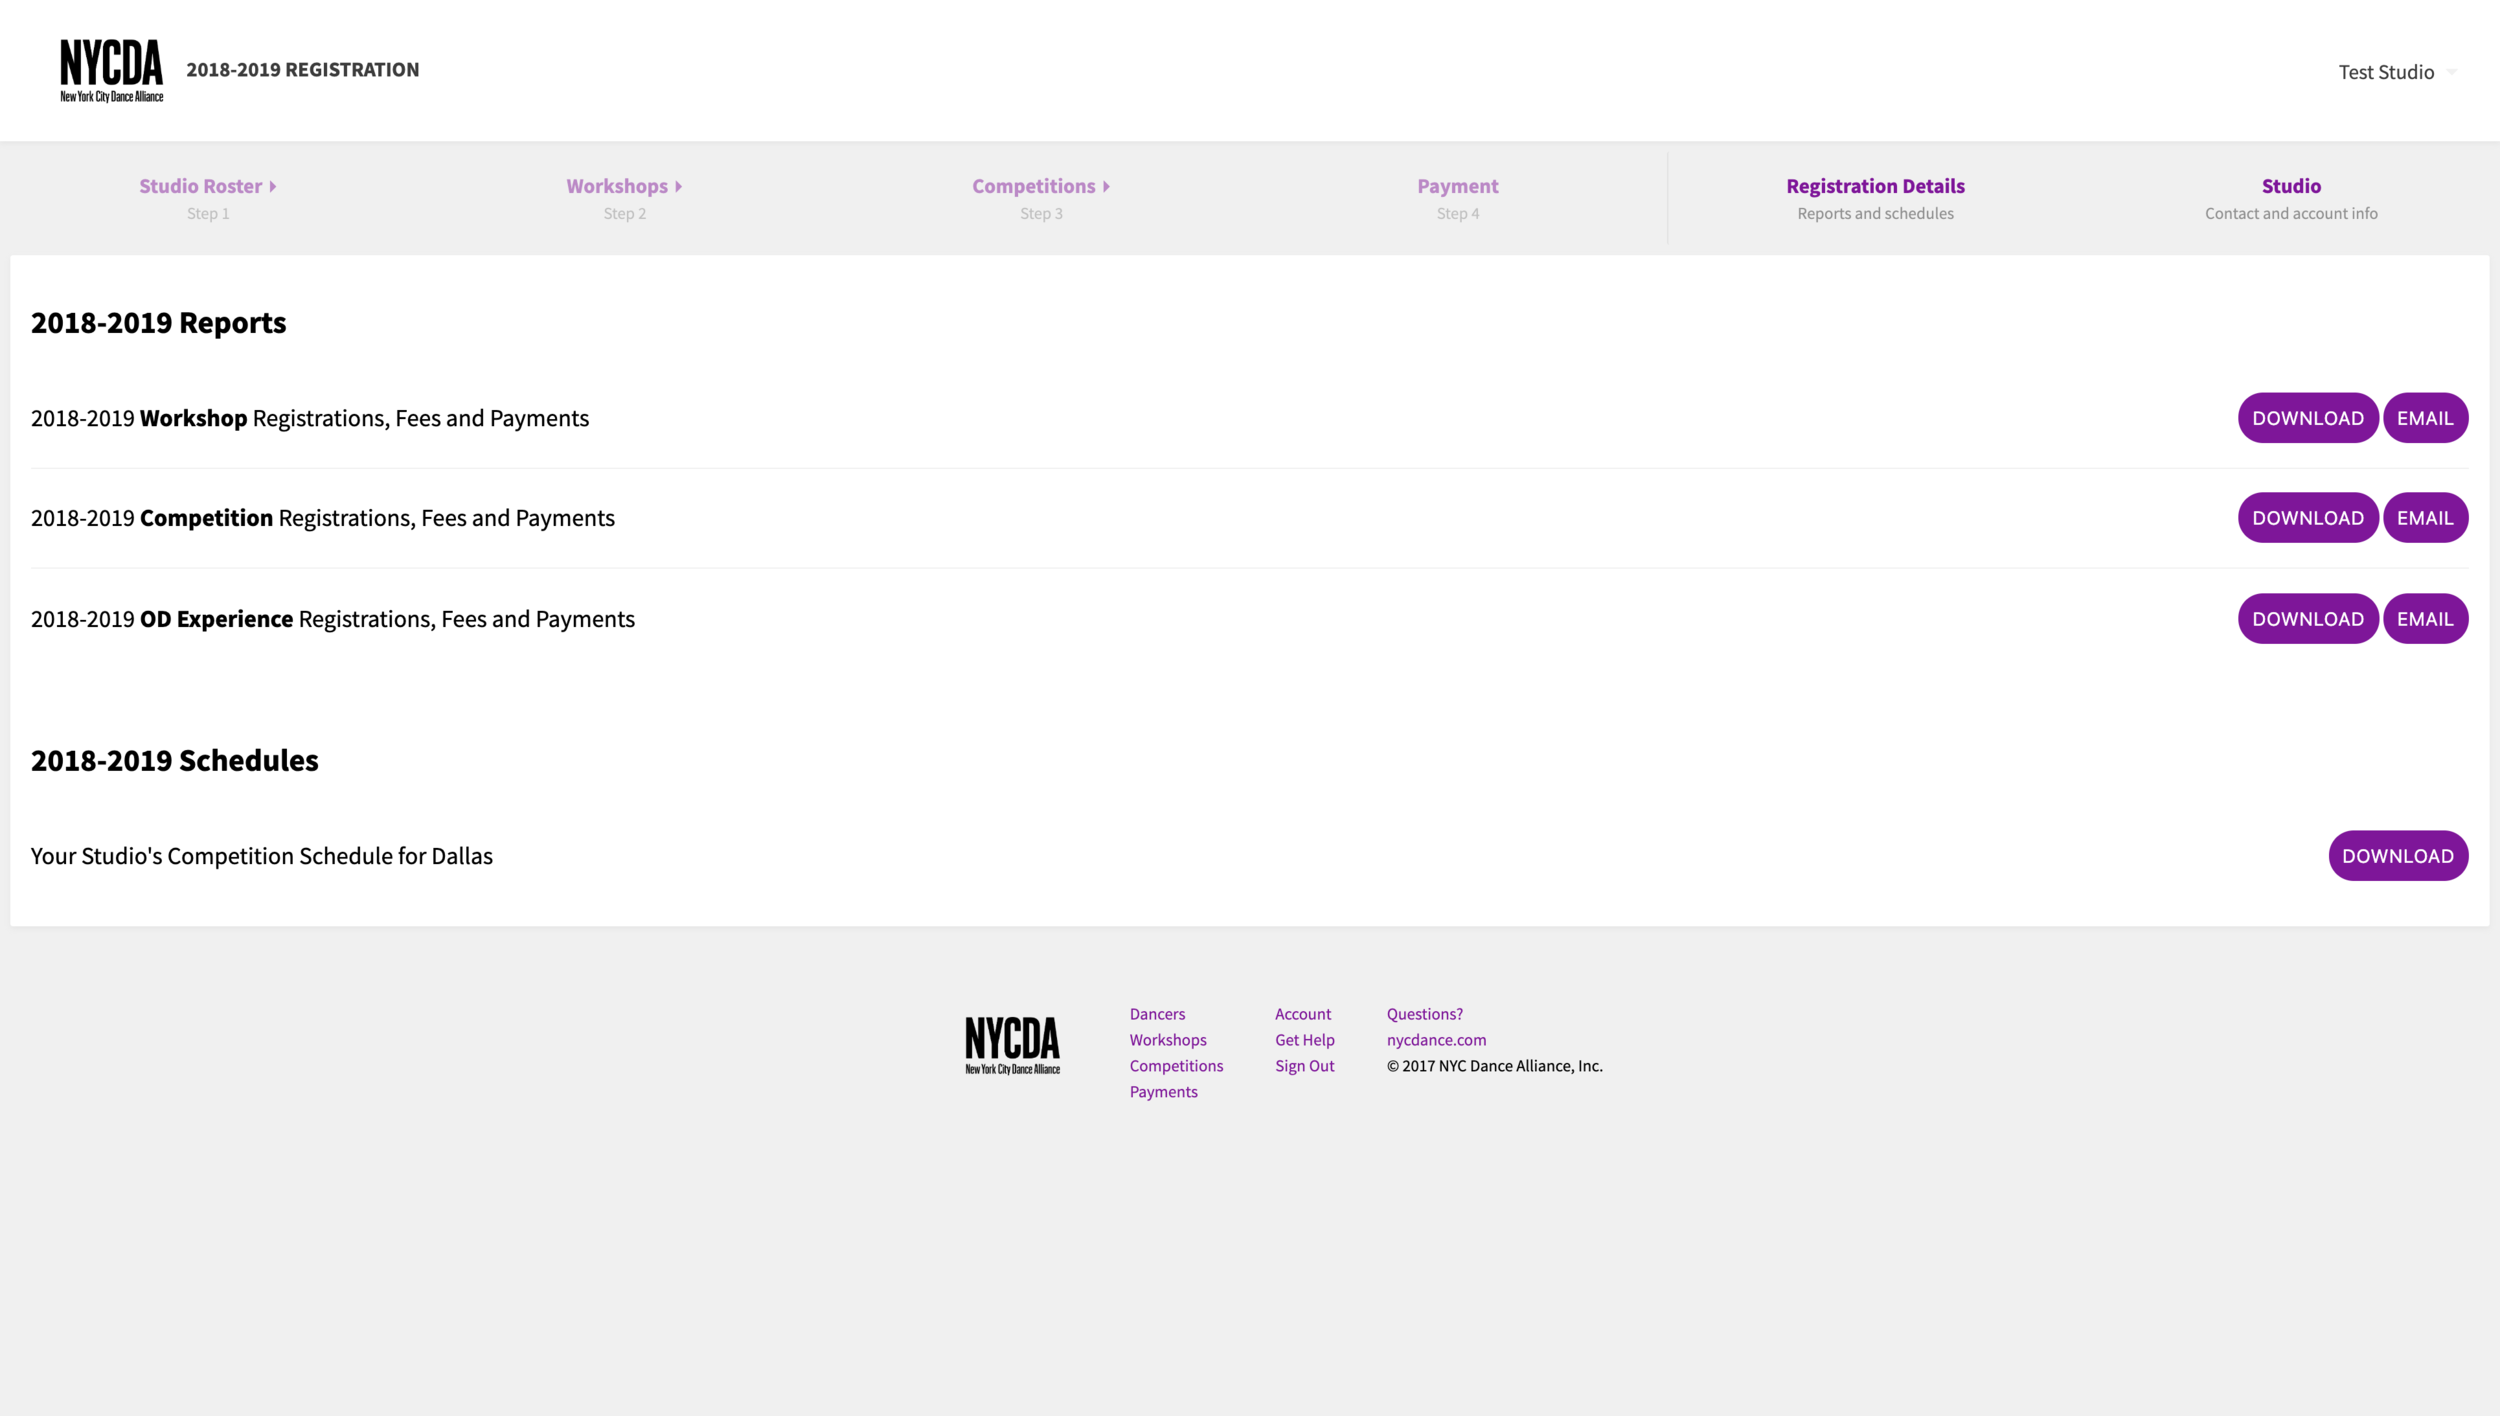 Registration details (wireframes)